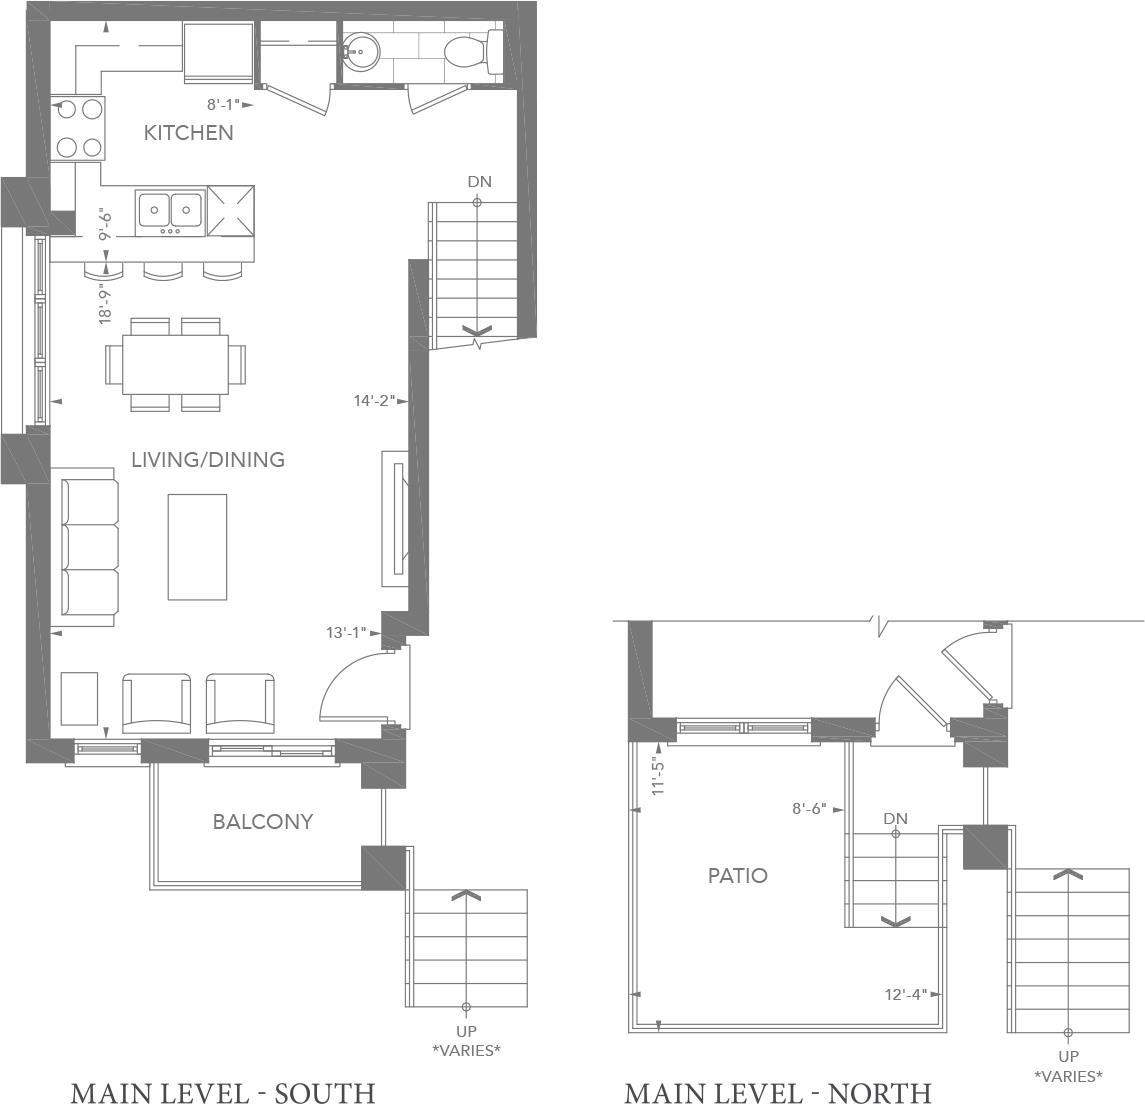 2A-E Floorplan 1